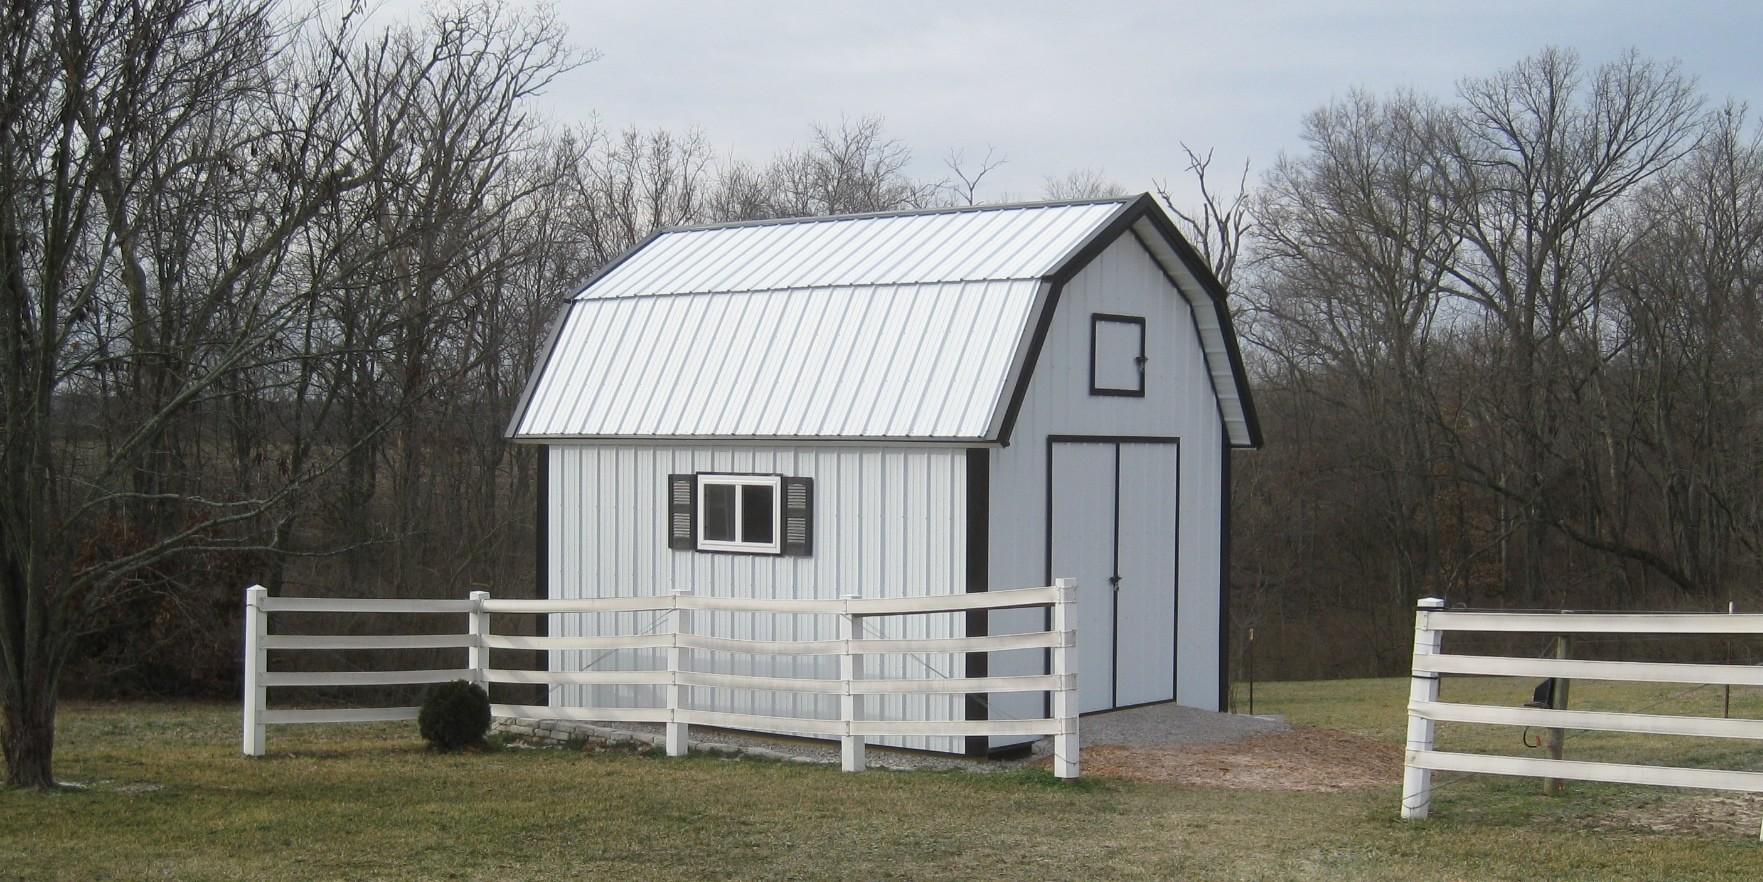 Barn Shed Plans Classic American Gambrel Diy Barn Designs